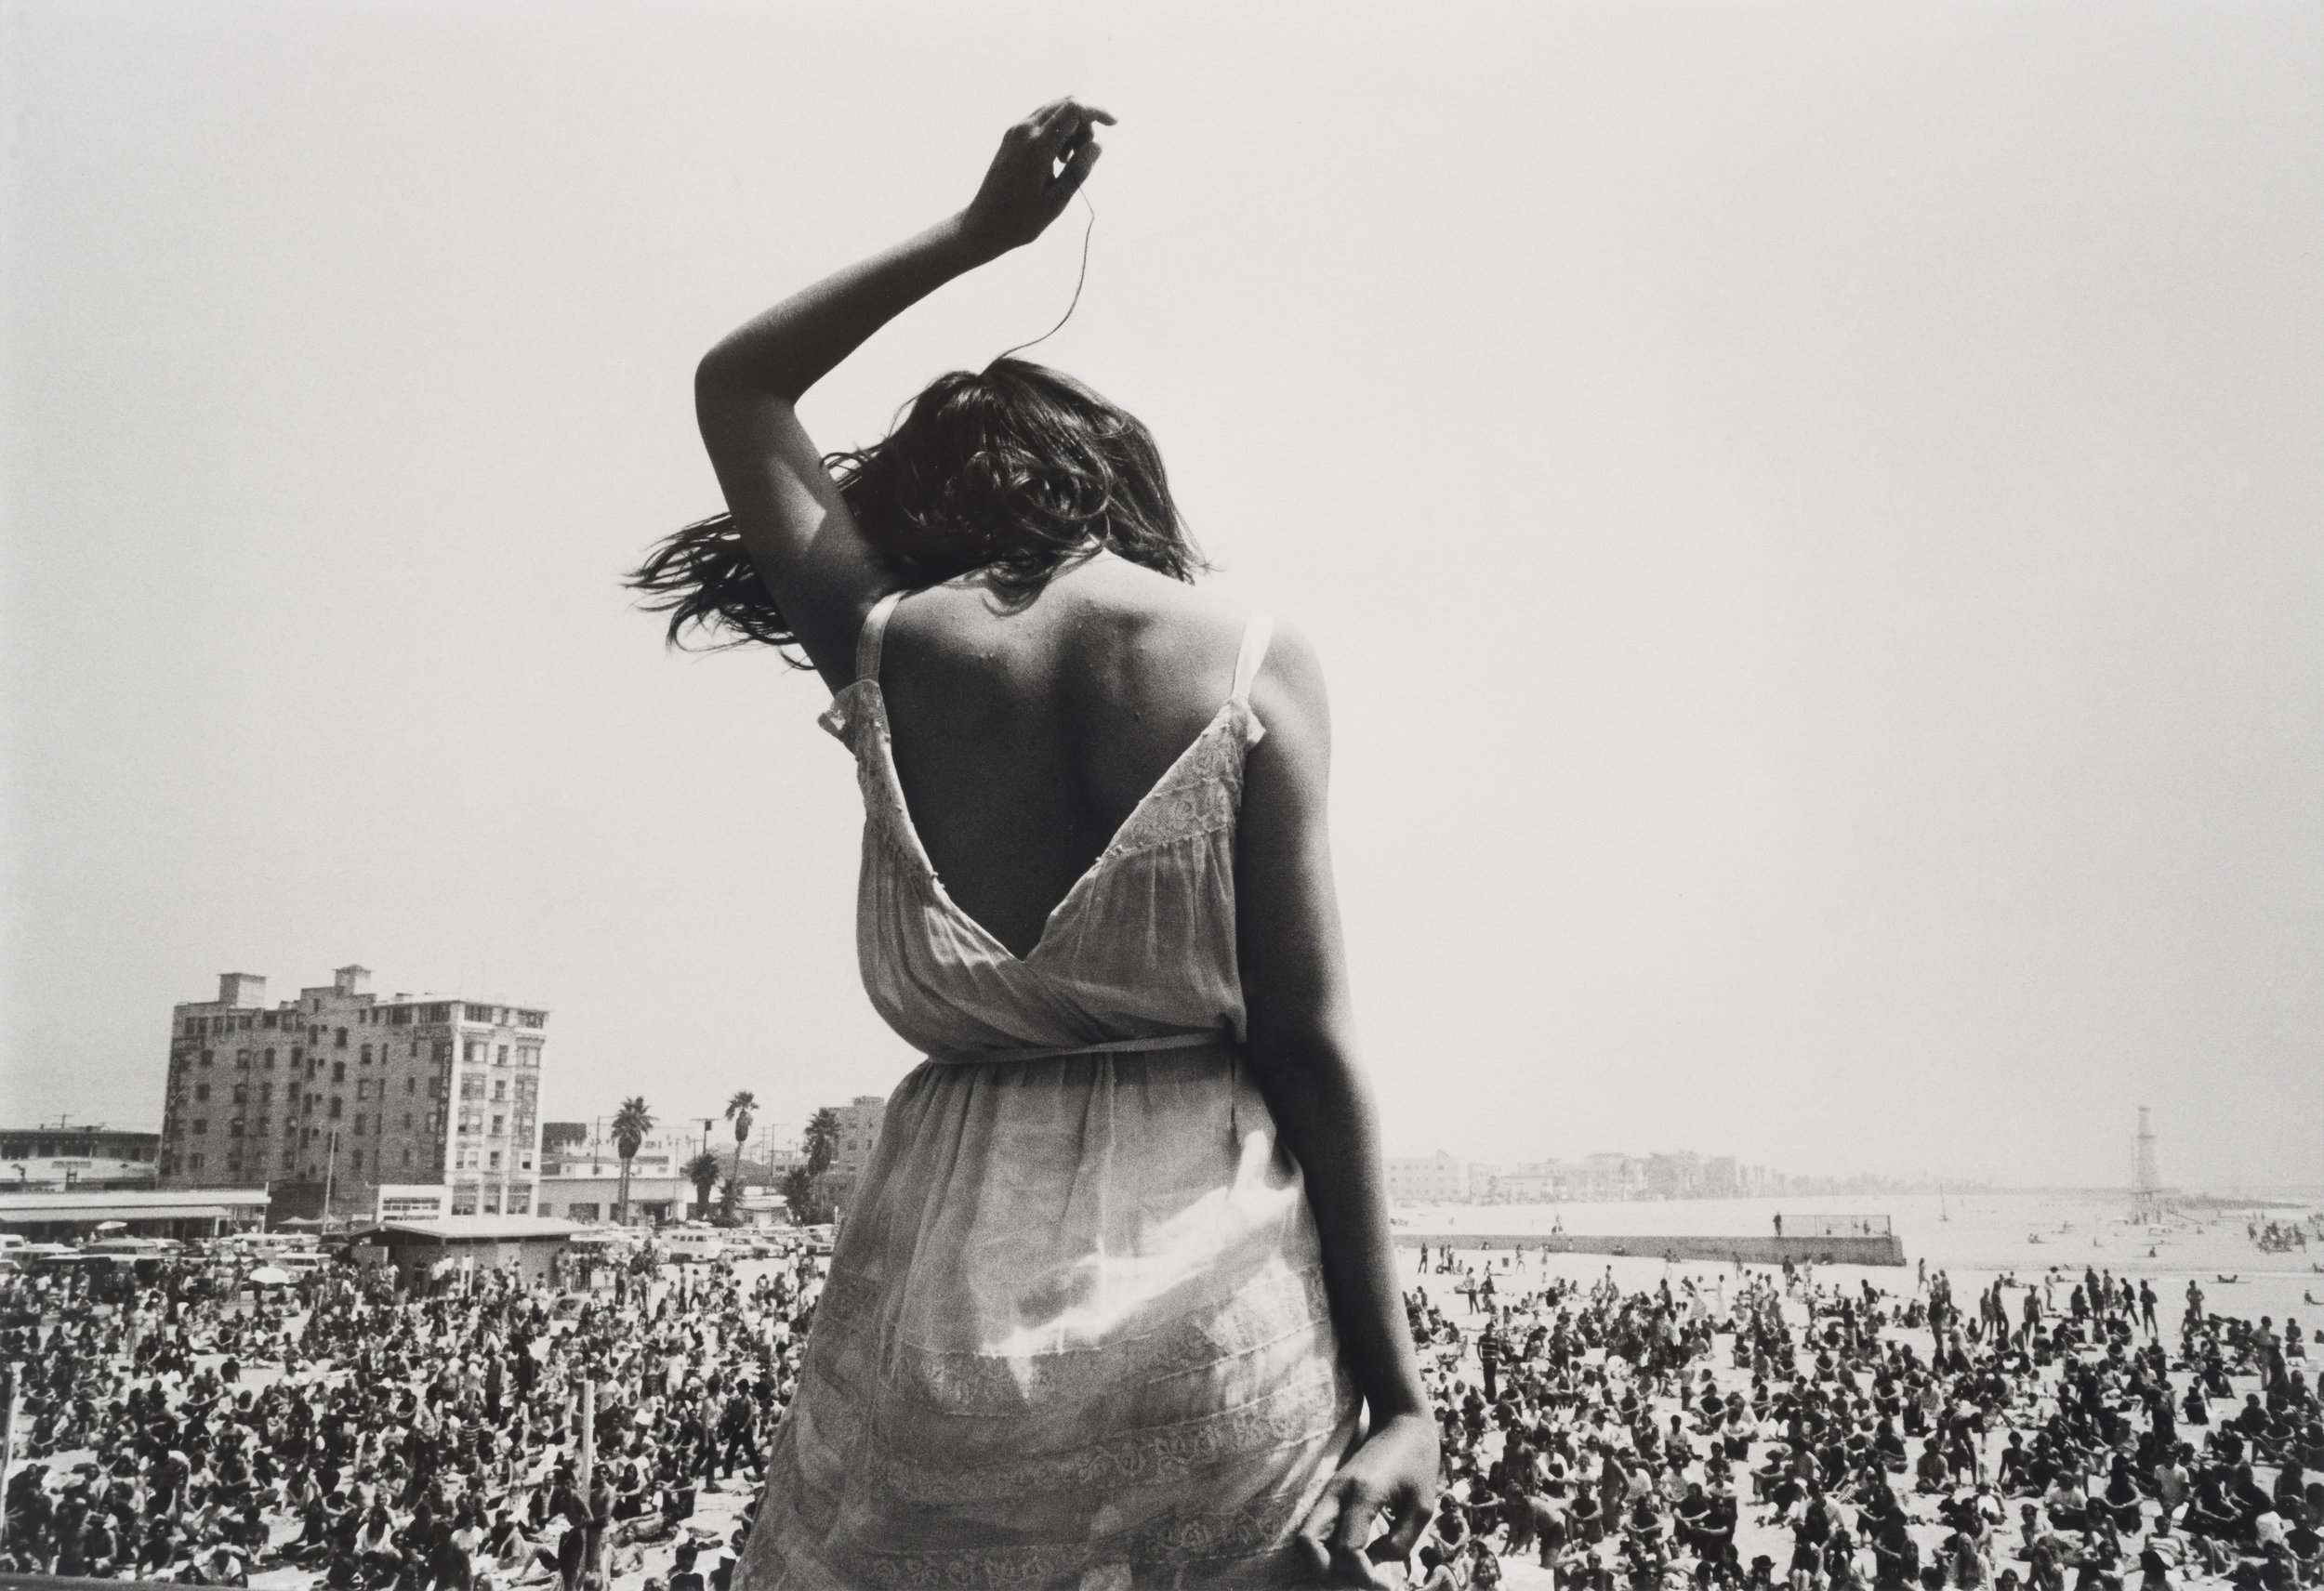 Venice, California, 1968